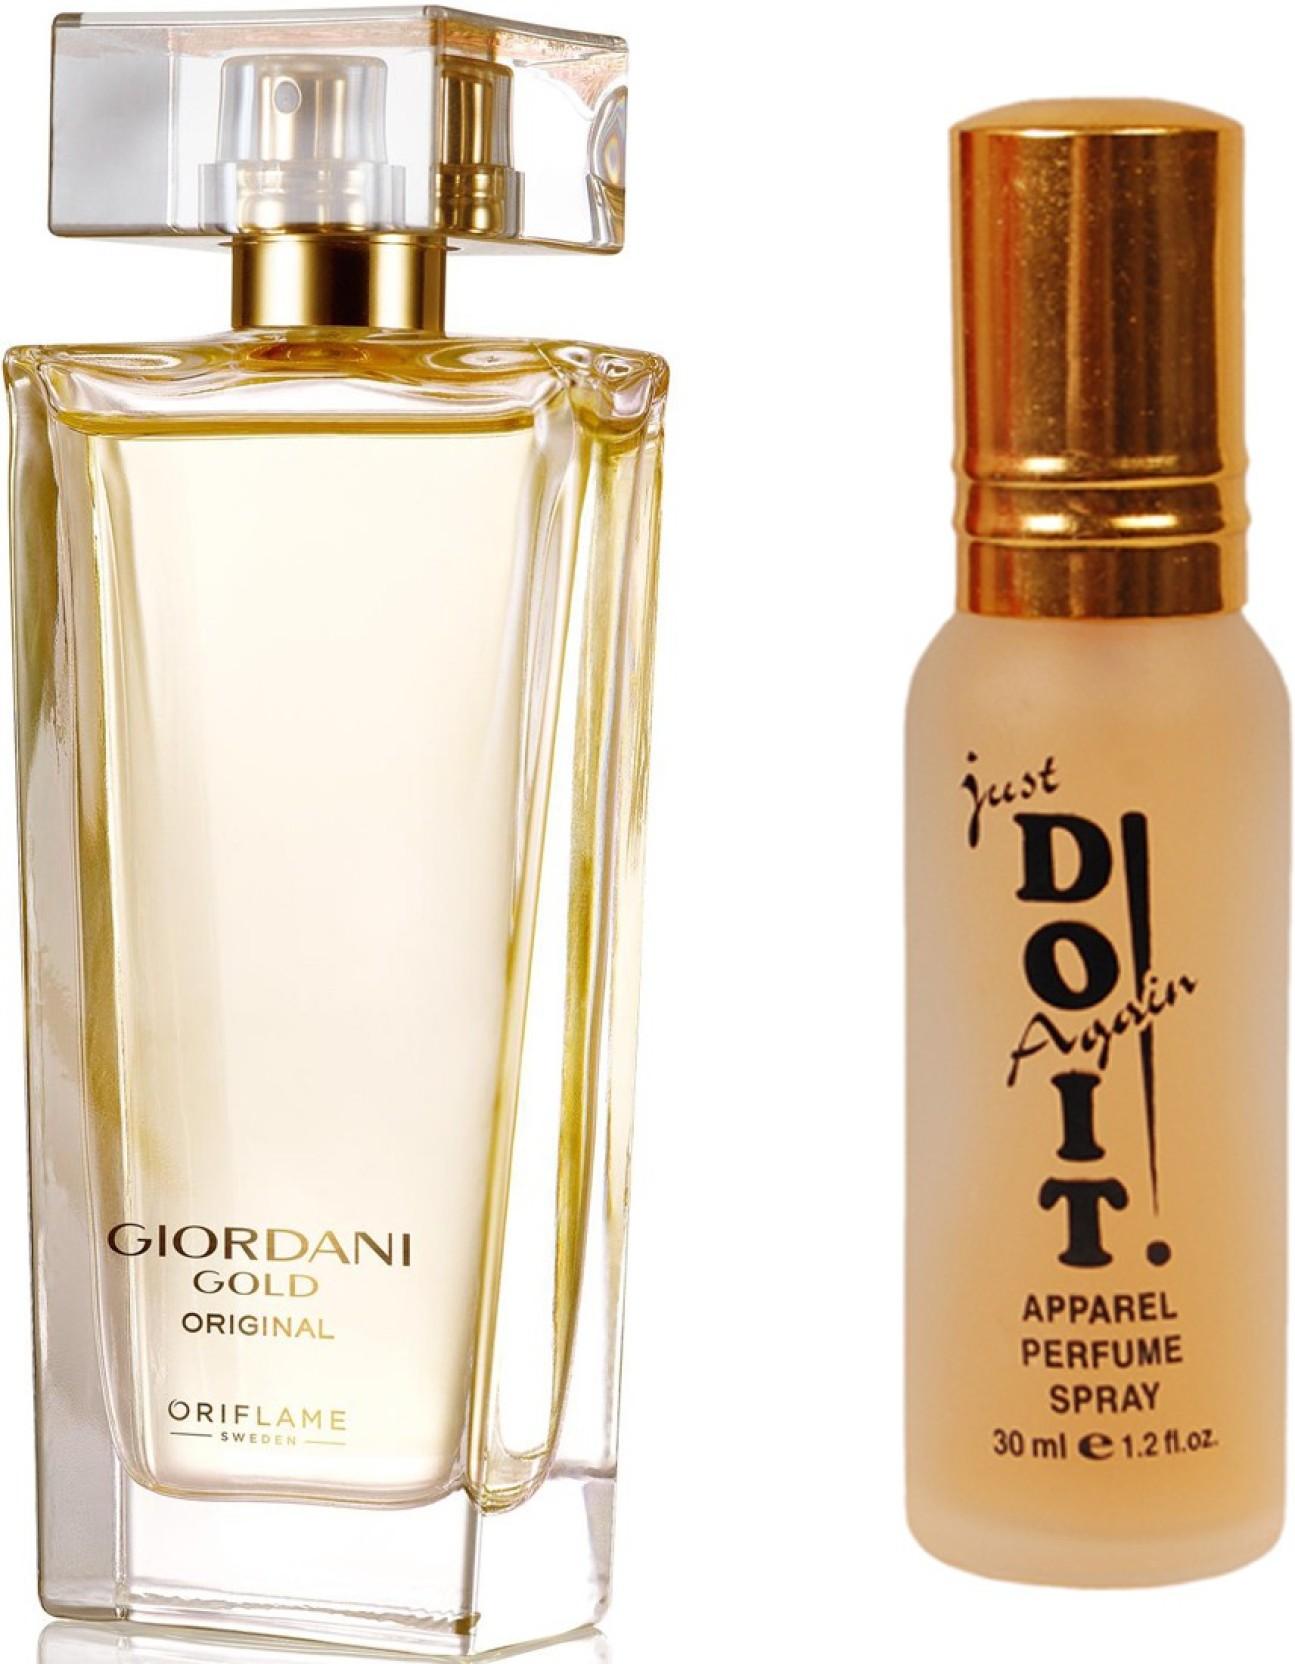 Oriflame Sweden Giordani Gold Original Eau De Parfum 50ml With Just Body Cream Essenza Add To Cart